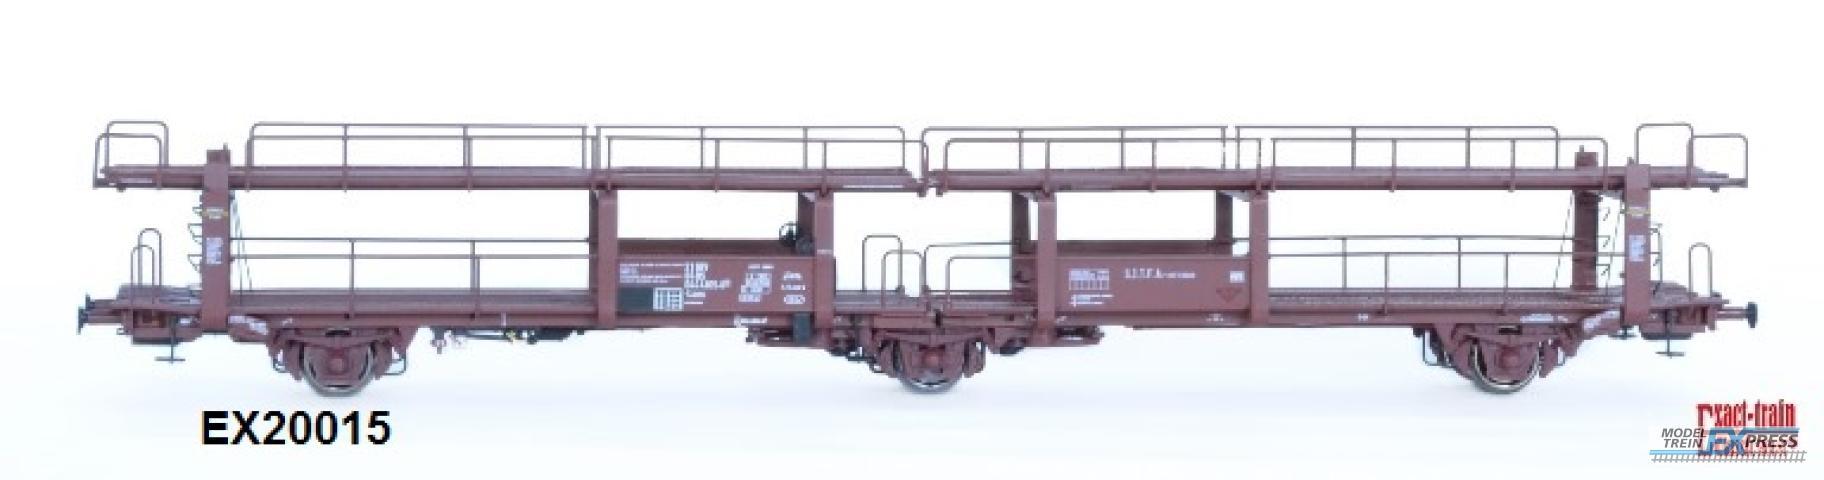 Exact-train 20015